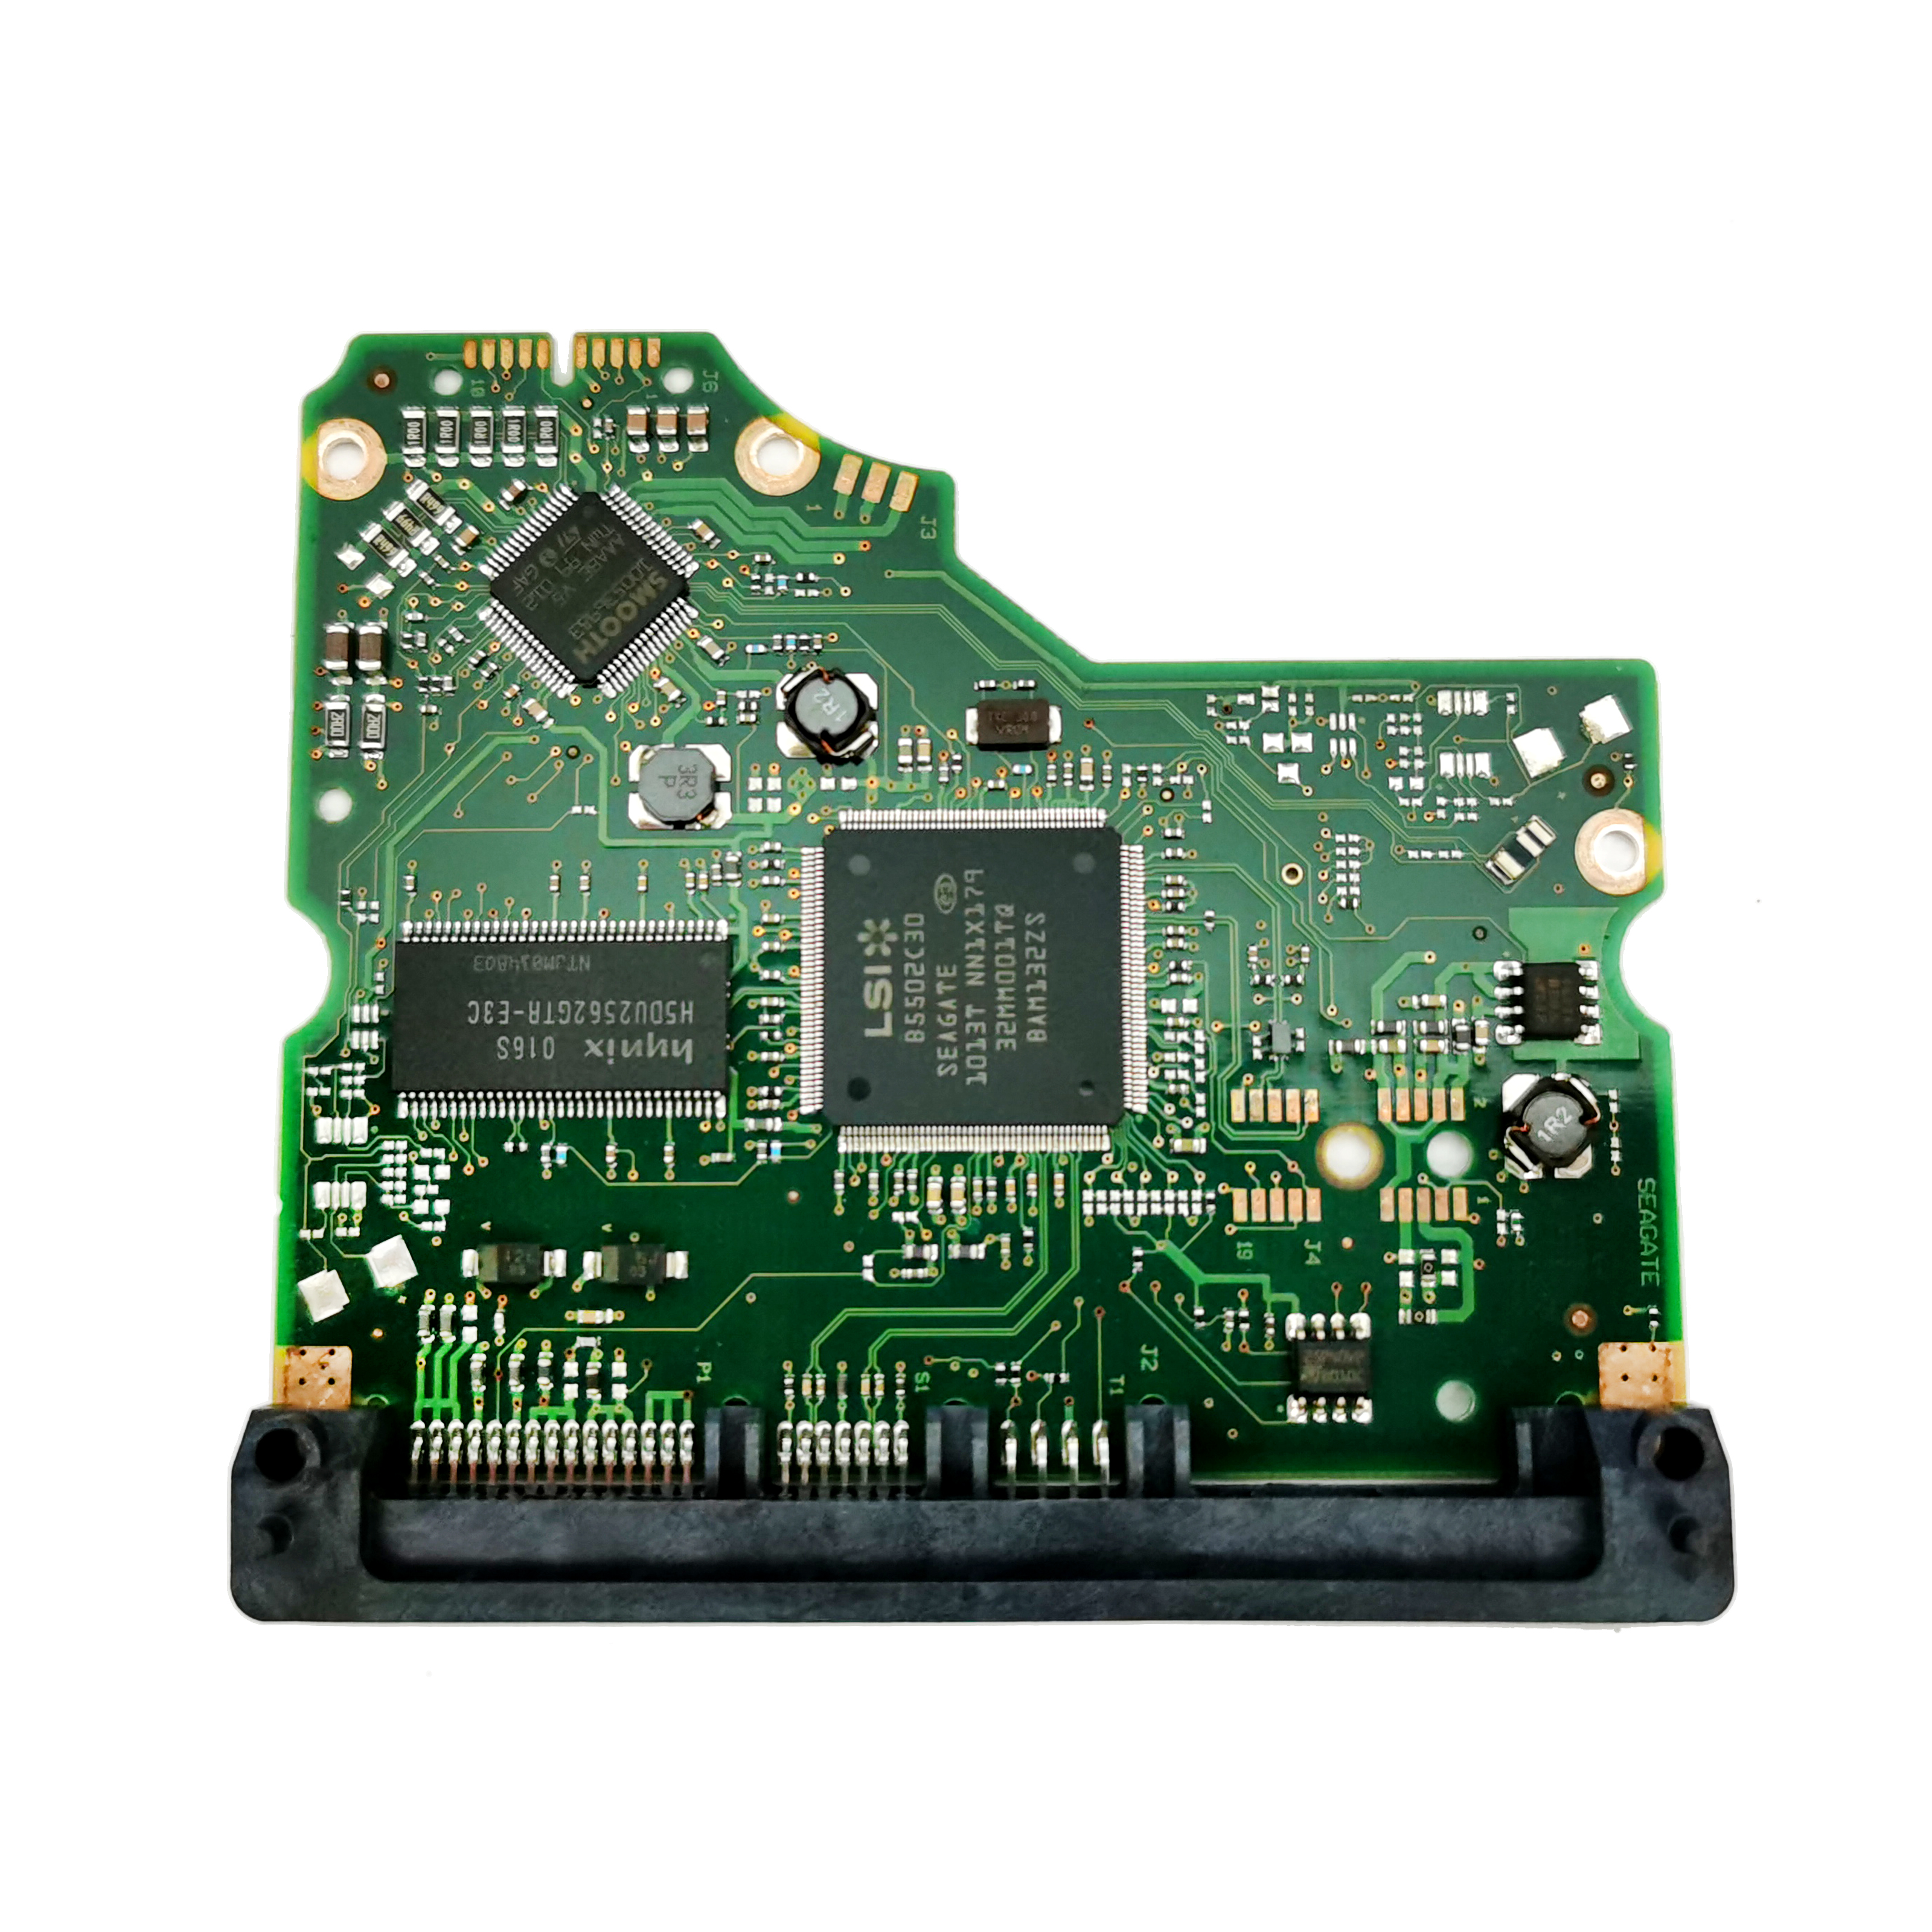 100% Original Hard Drive Parts PCB Logic Board Printed Circuit Board 100536501 For Seagate 3.5 SATA Hdd Data Recovery Hard Drive